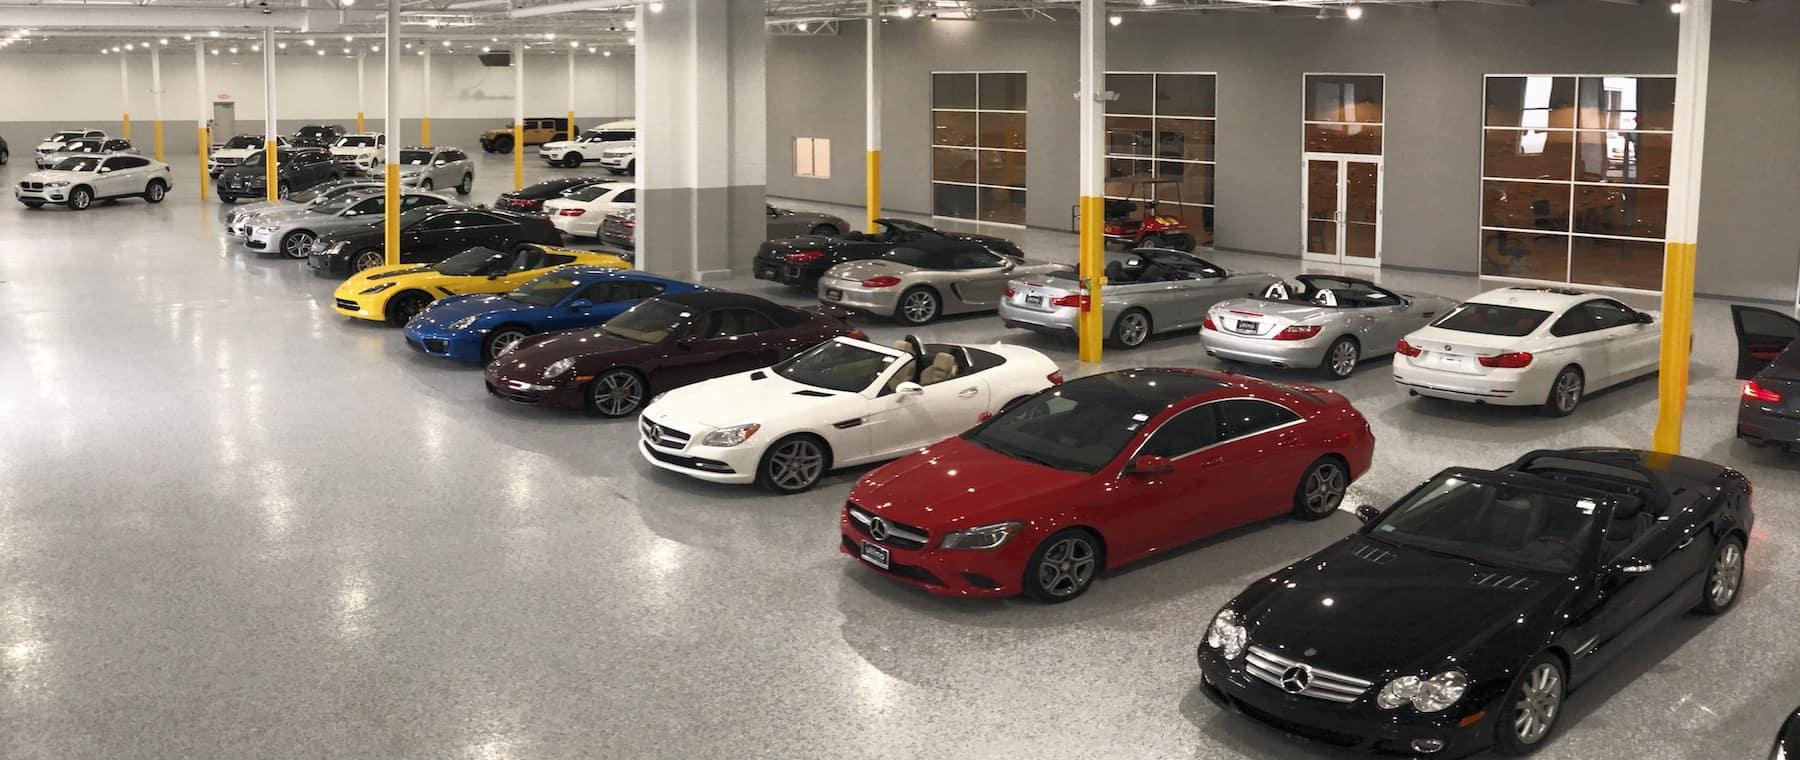 Ultimo Motors NorthShore